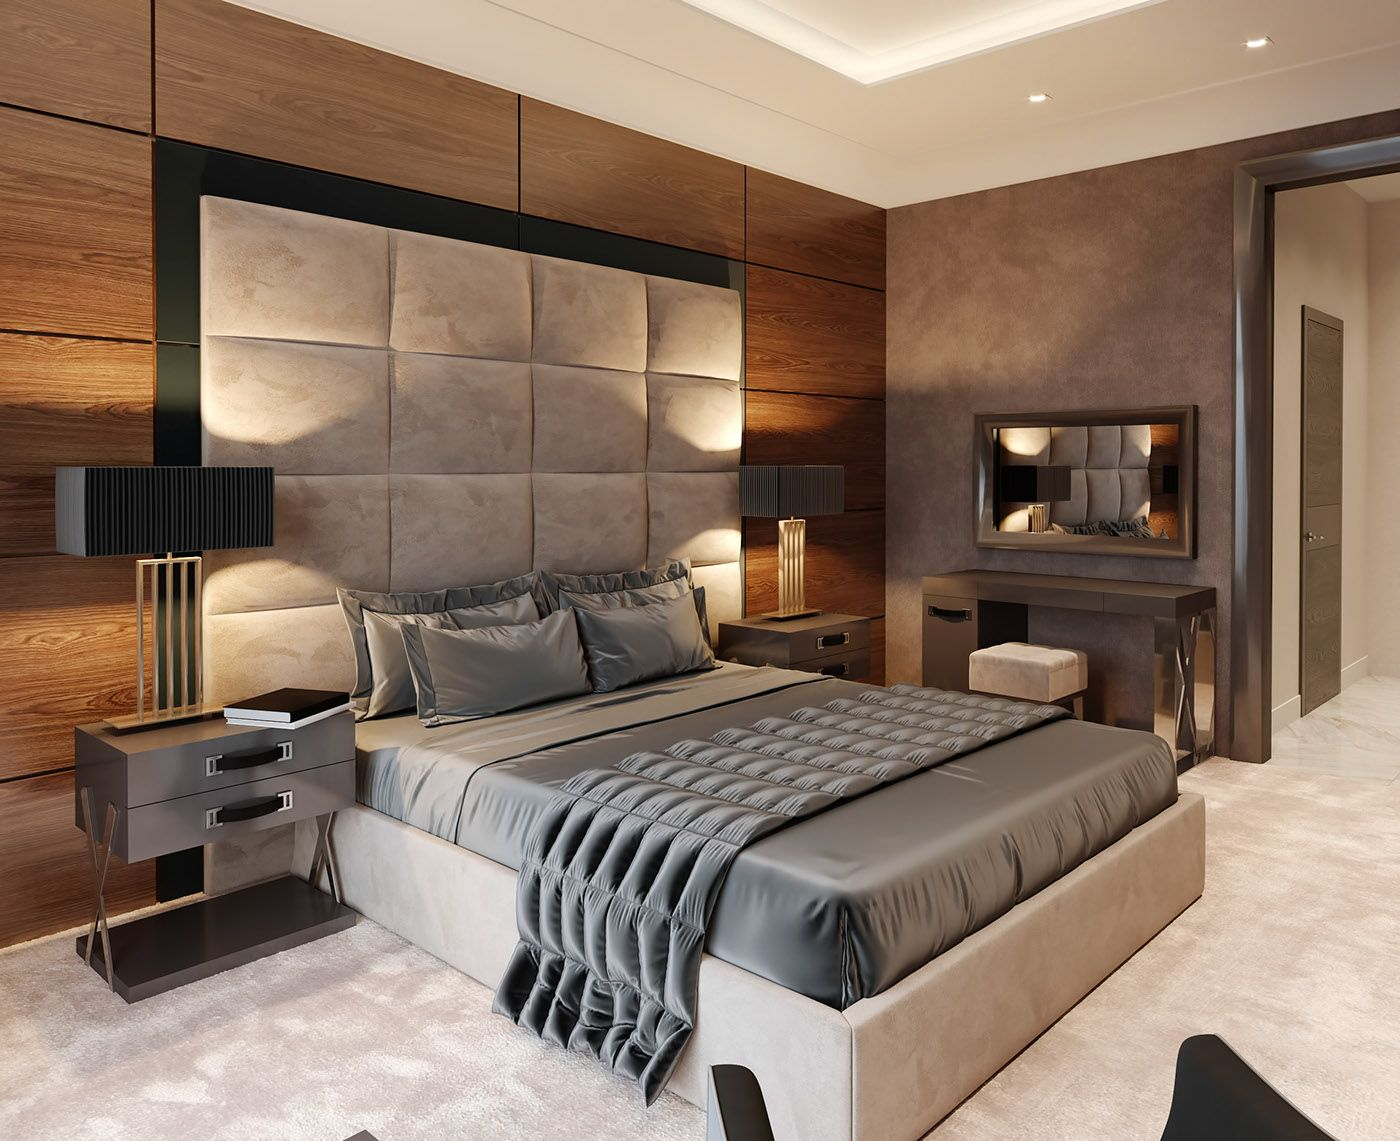 Hotel Room On Behance Hotel Bedroom Design Modern Luxury Bedroom Luxury Bedroom Design